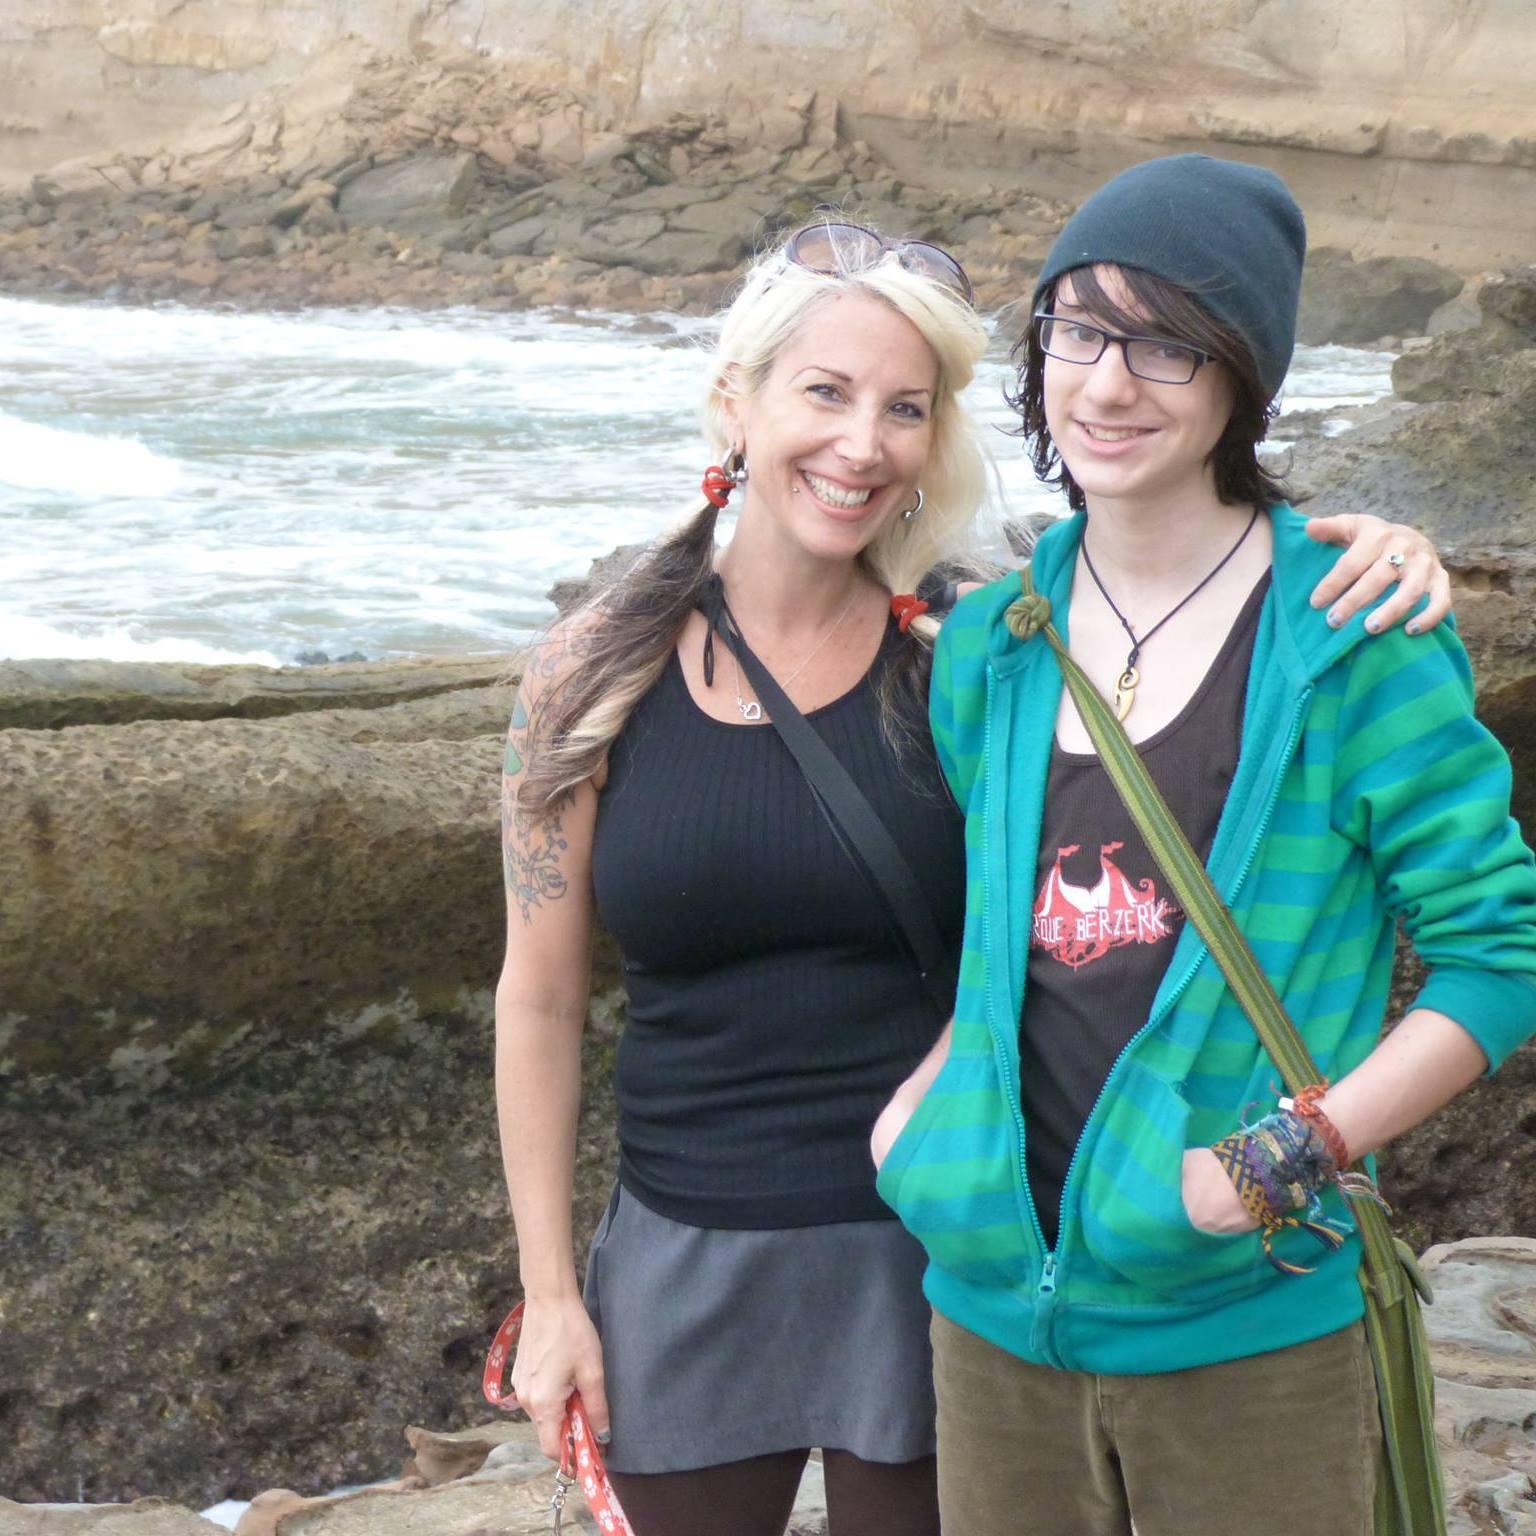 Lainie & Miro on Ecuador's coast